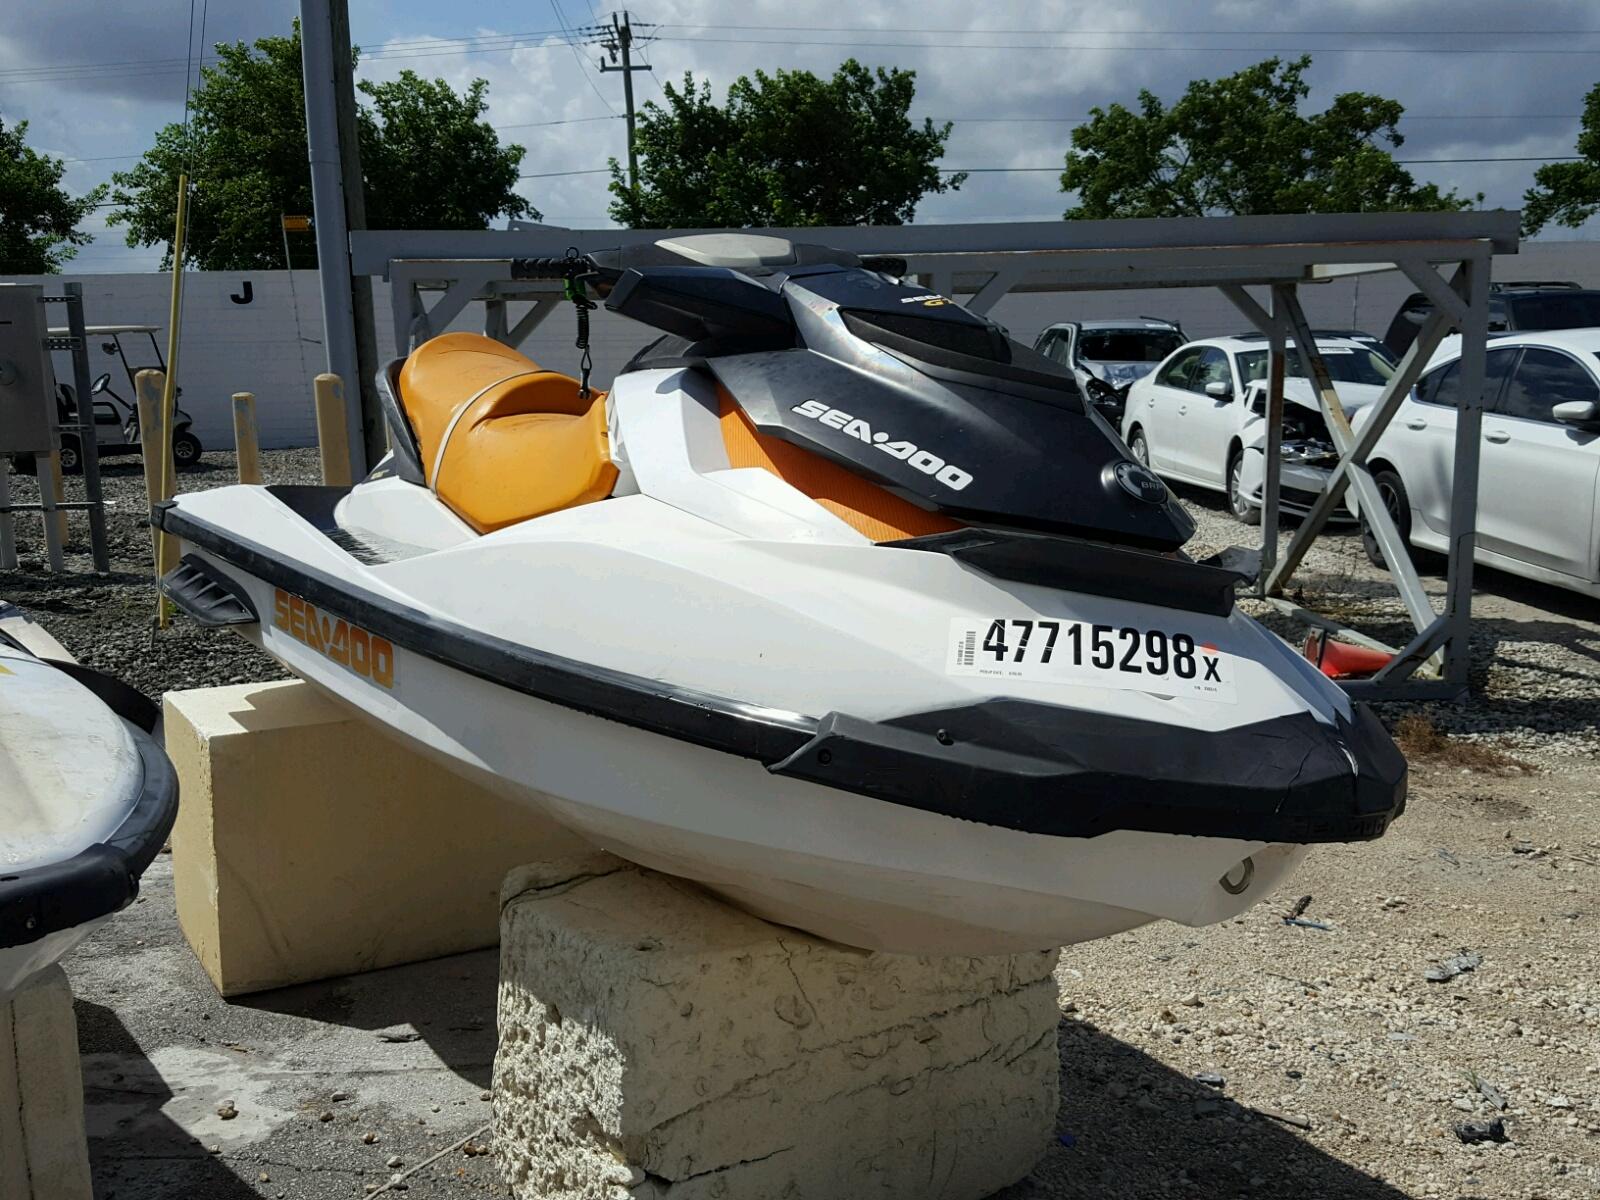 Salvage 2015 Seadoo GTS for sale